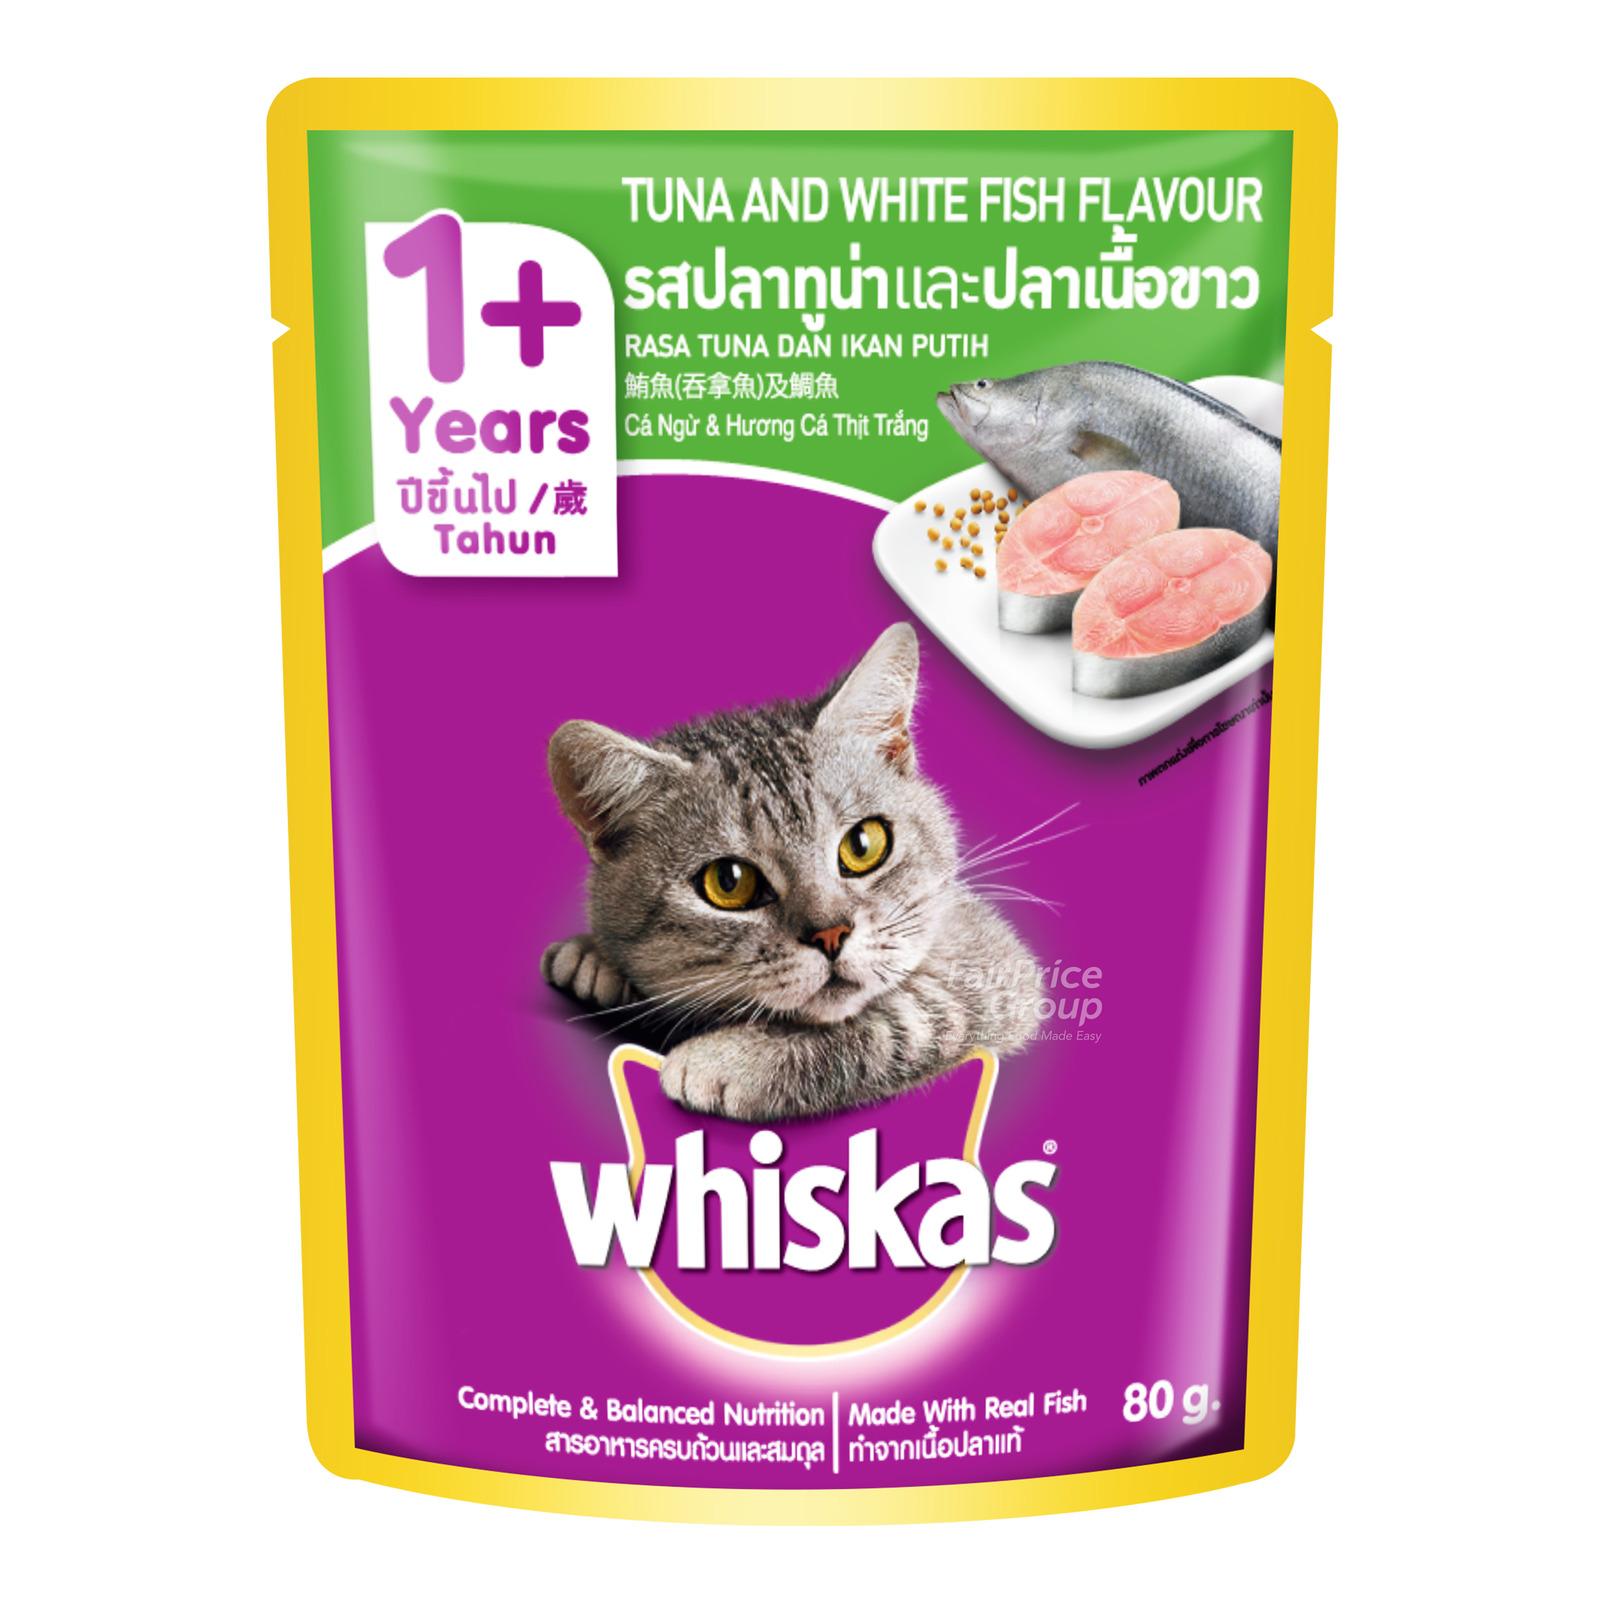 Whiskas Pouch Cat Food - Tuna White Fish